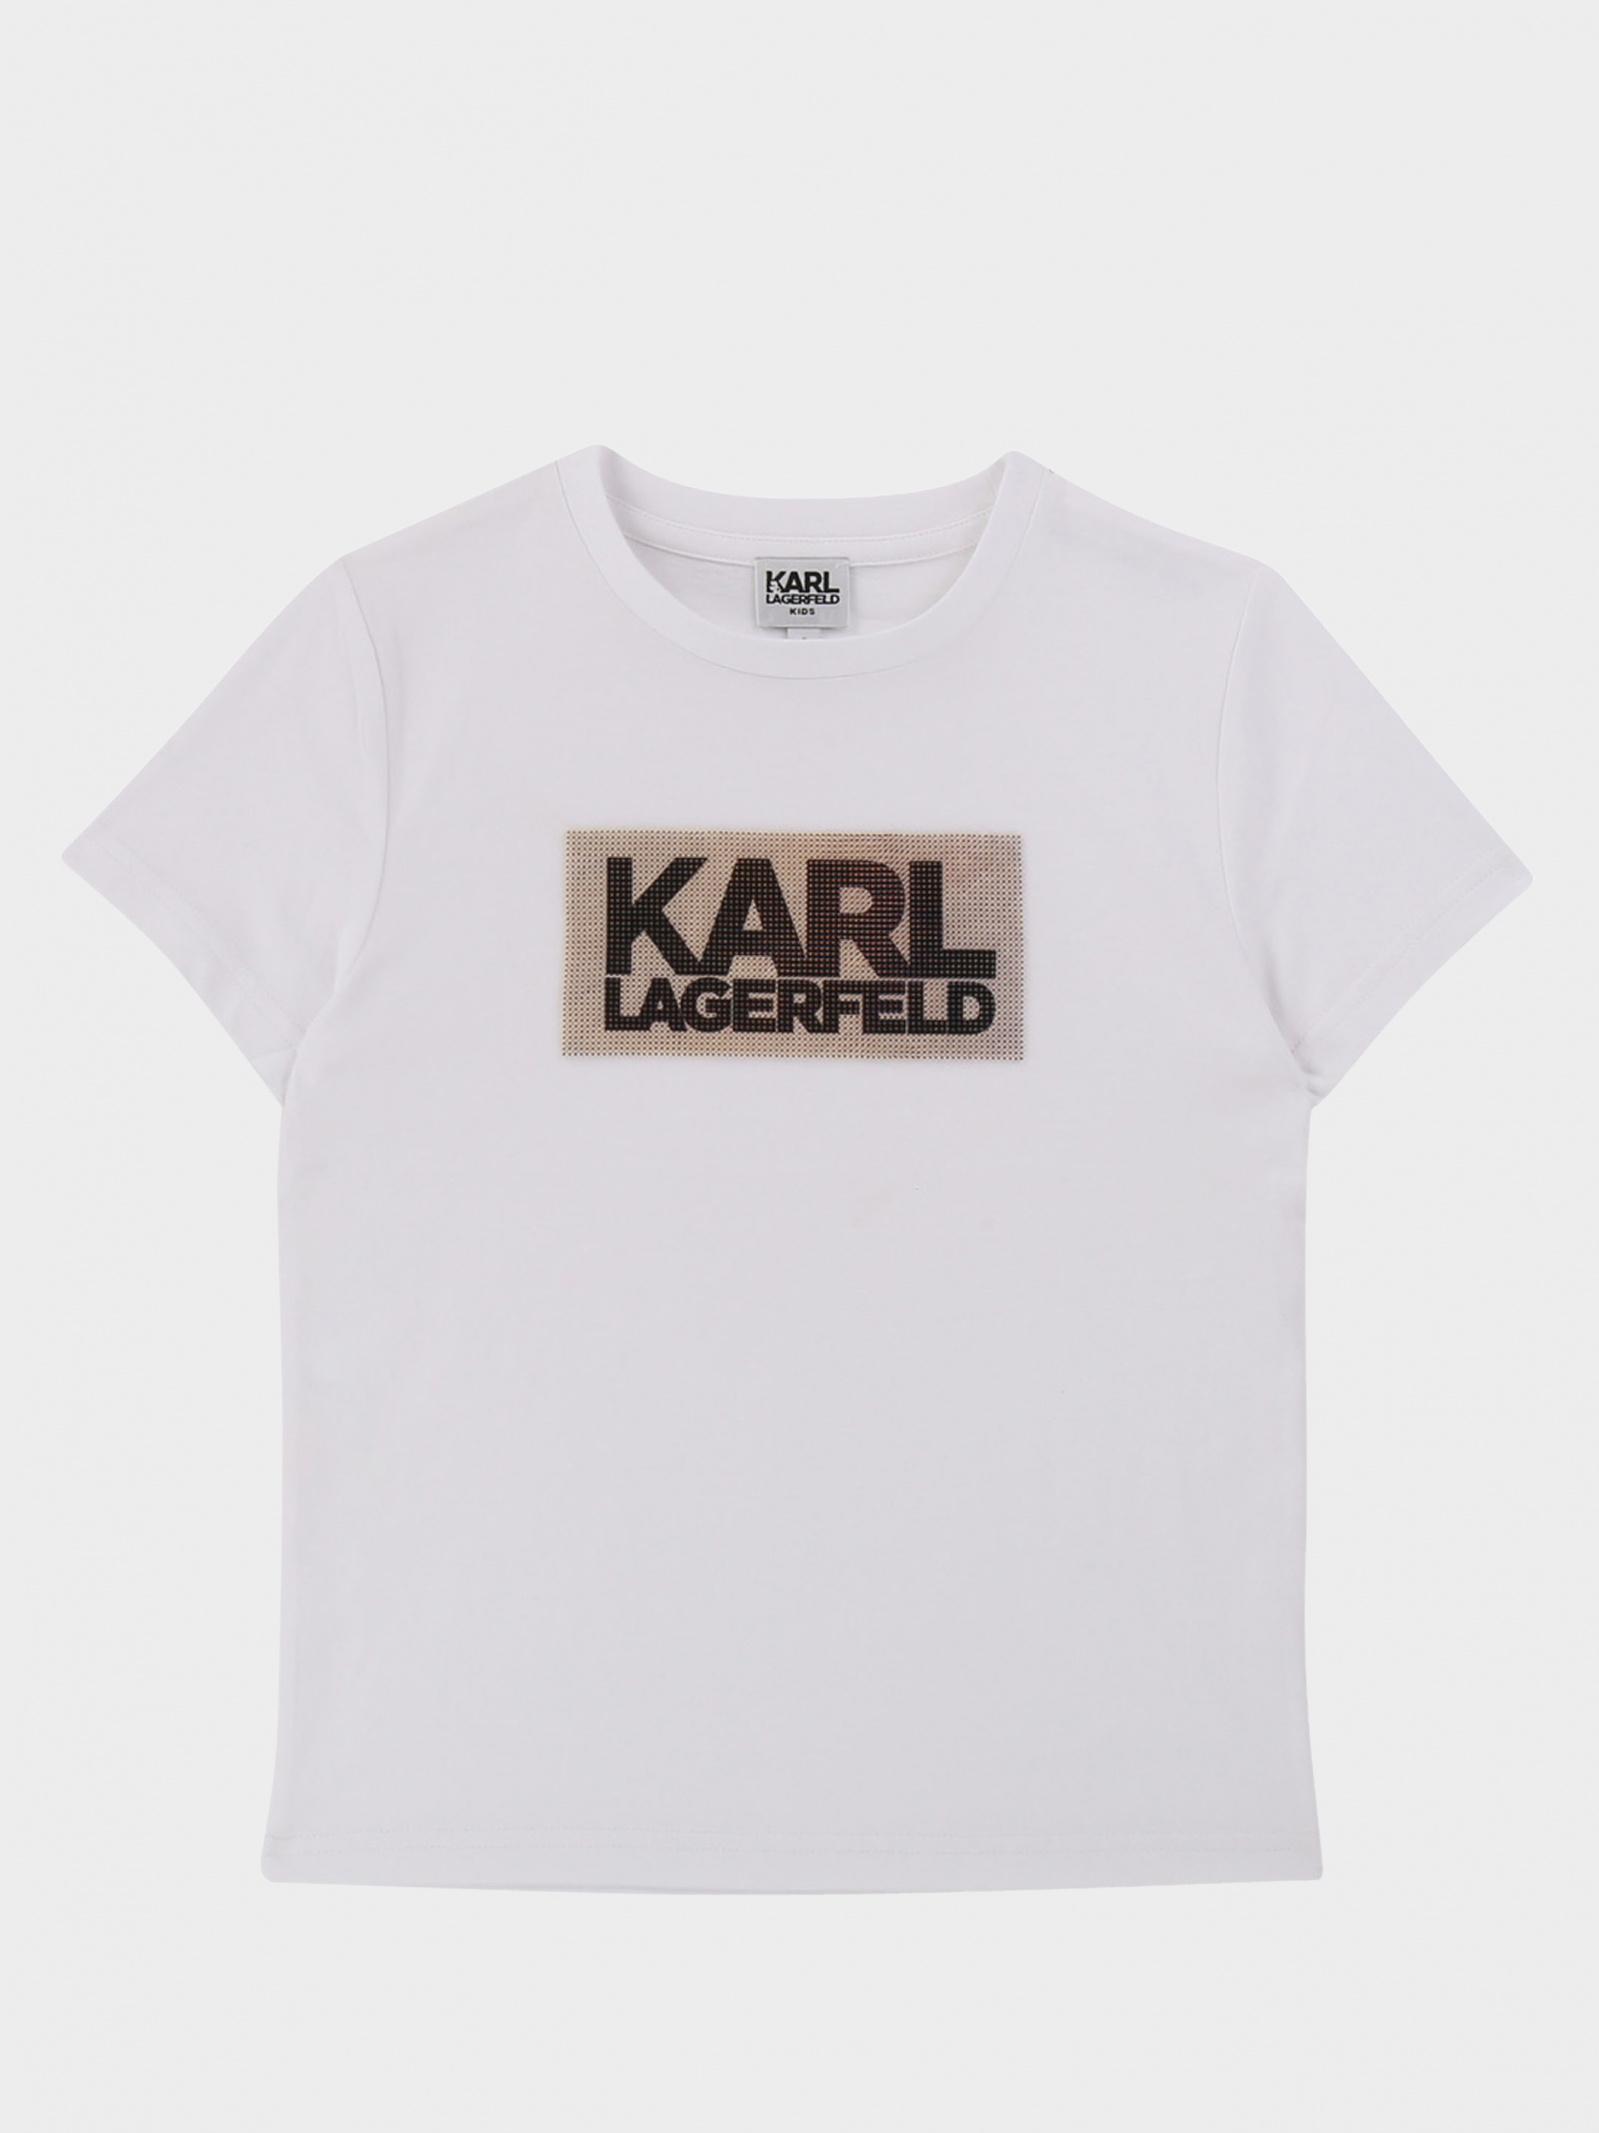 Футболка детские KARL LAGERFELD модель HR280 отзывы, 2017